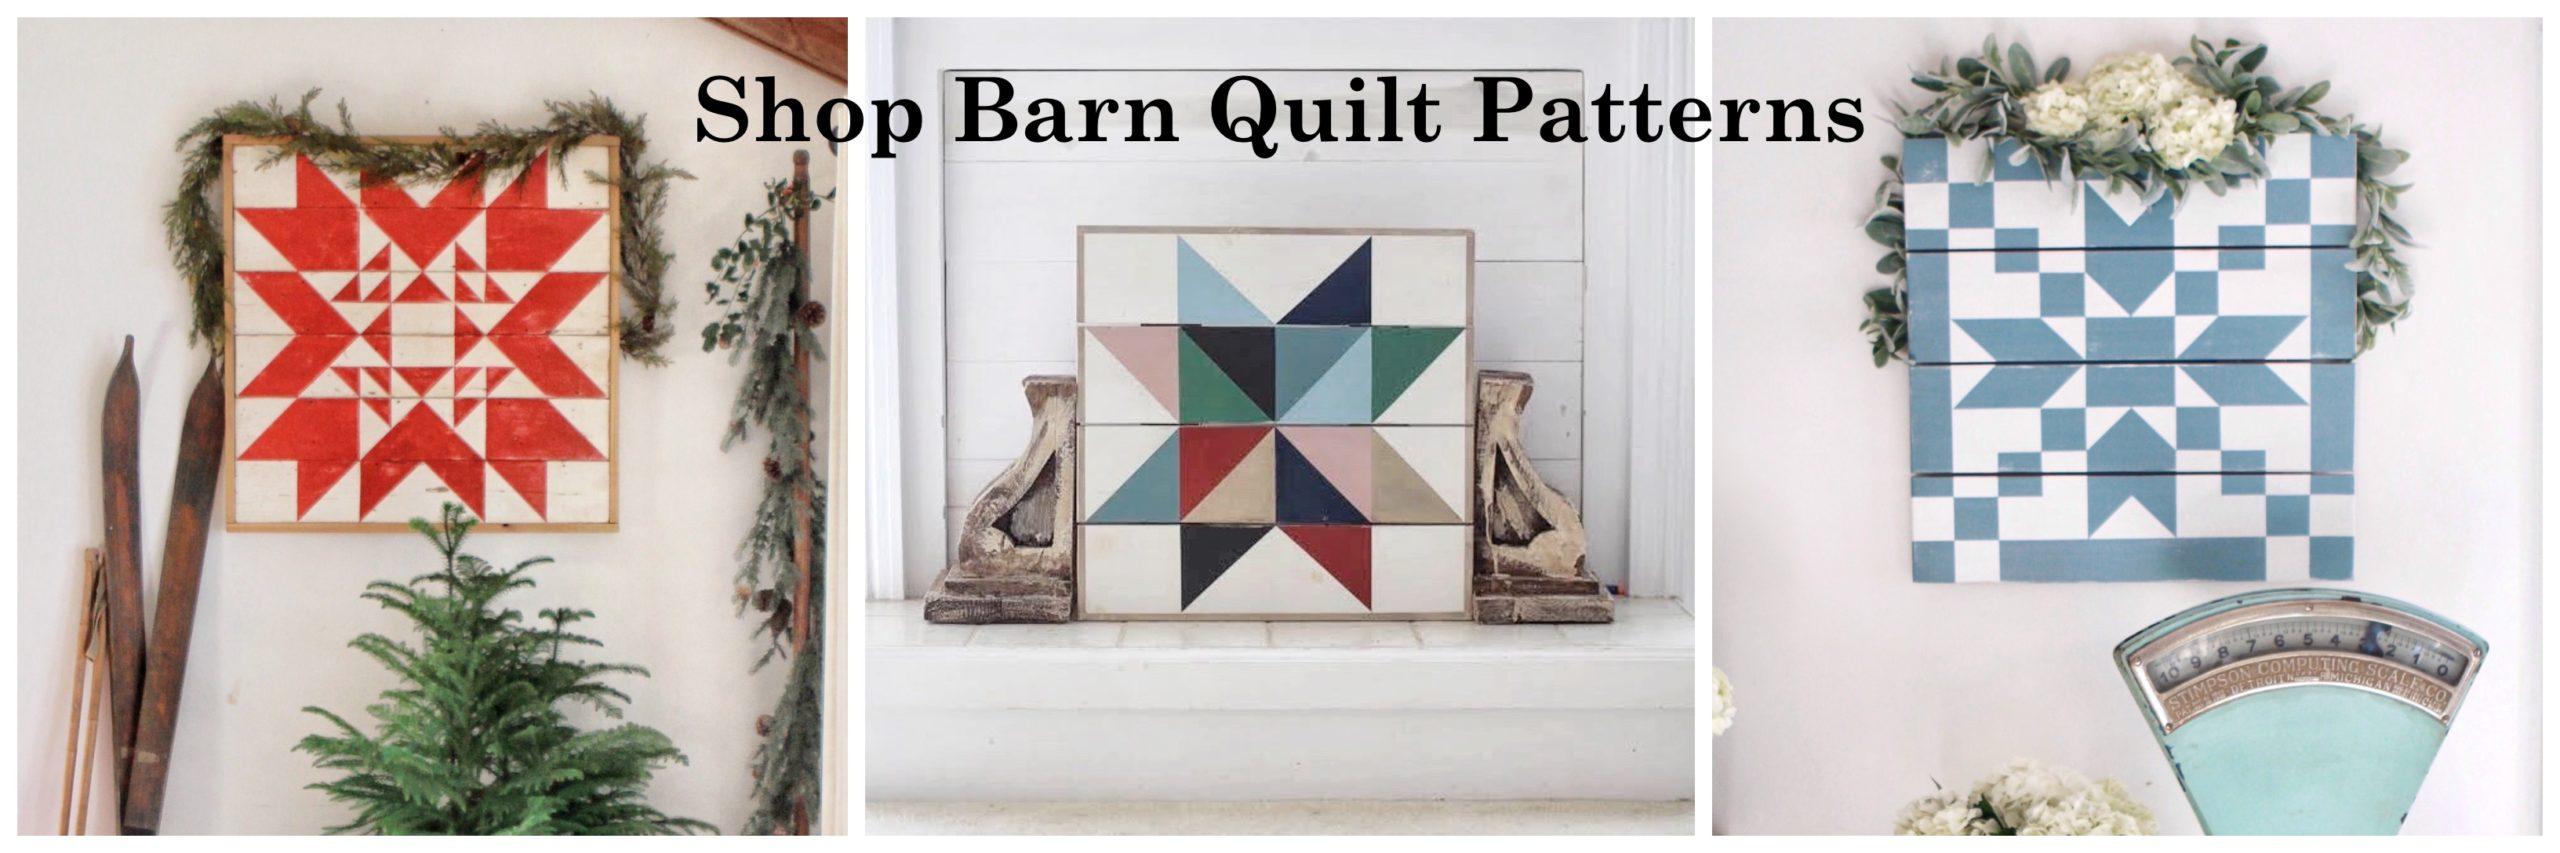 shop barn quilt patterns